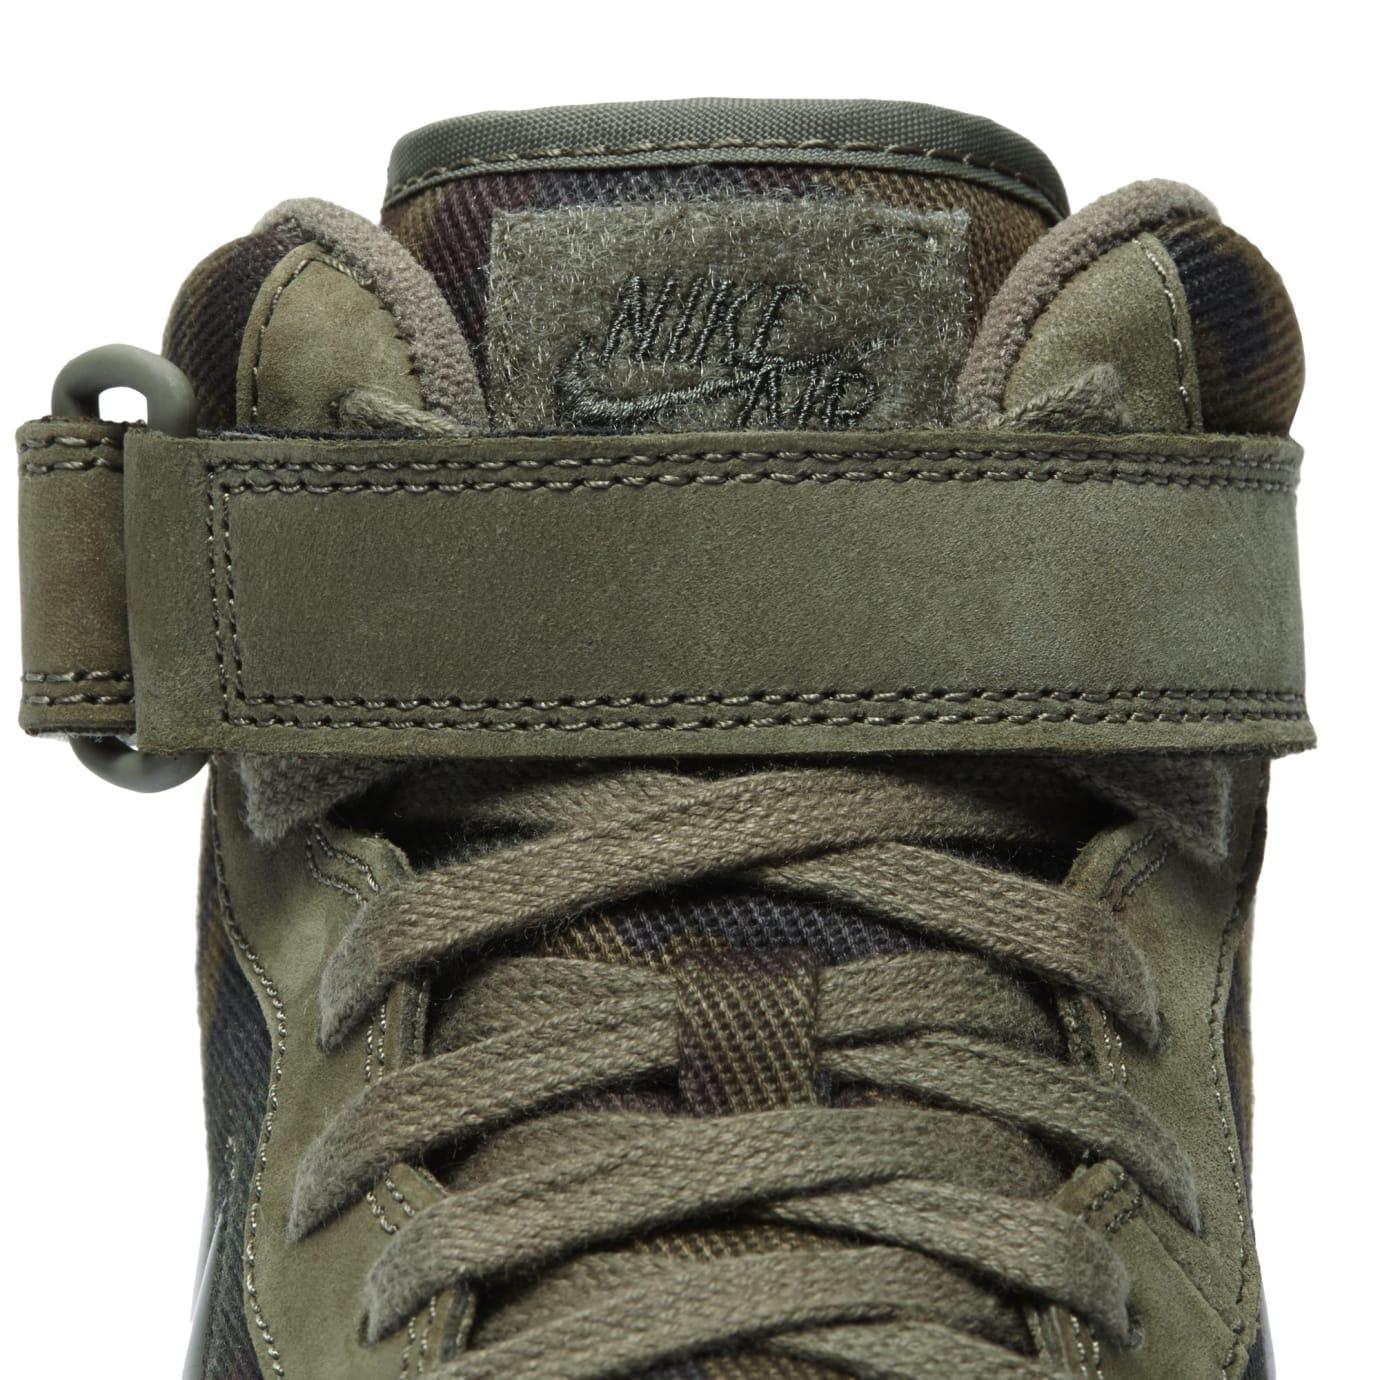 low priced d6ff5 5814d Image via Nike Nike Air Force 1 Mid  France Camo  AV2586-200 (Detail)